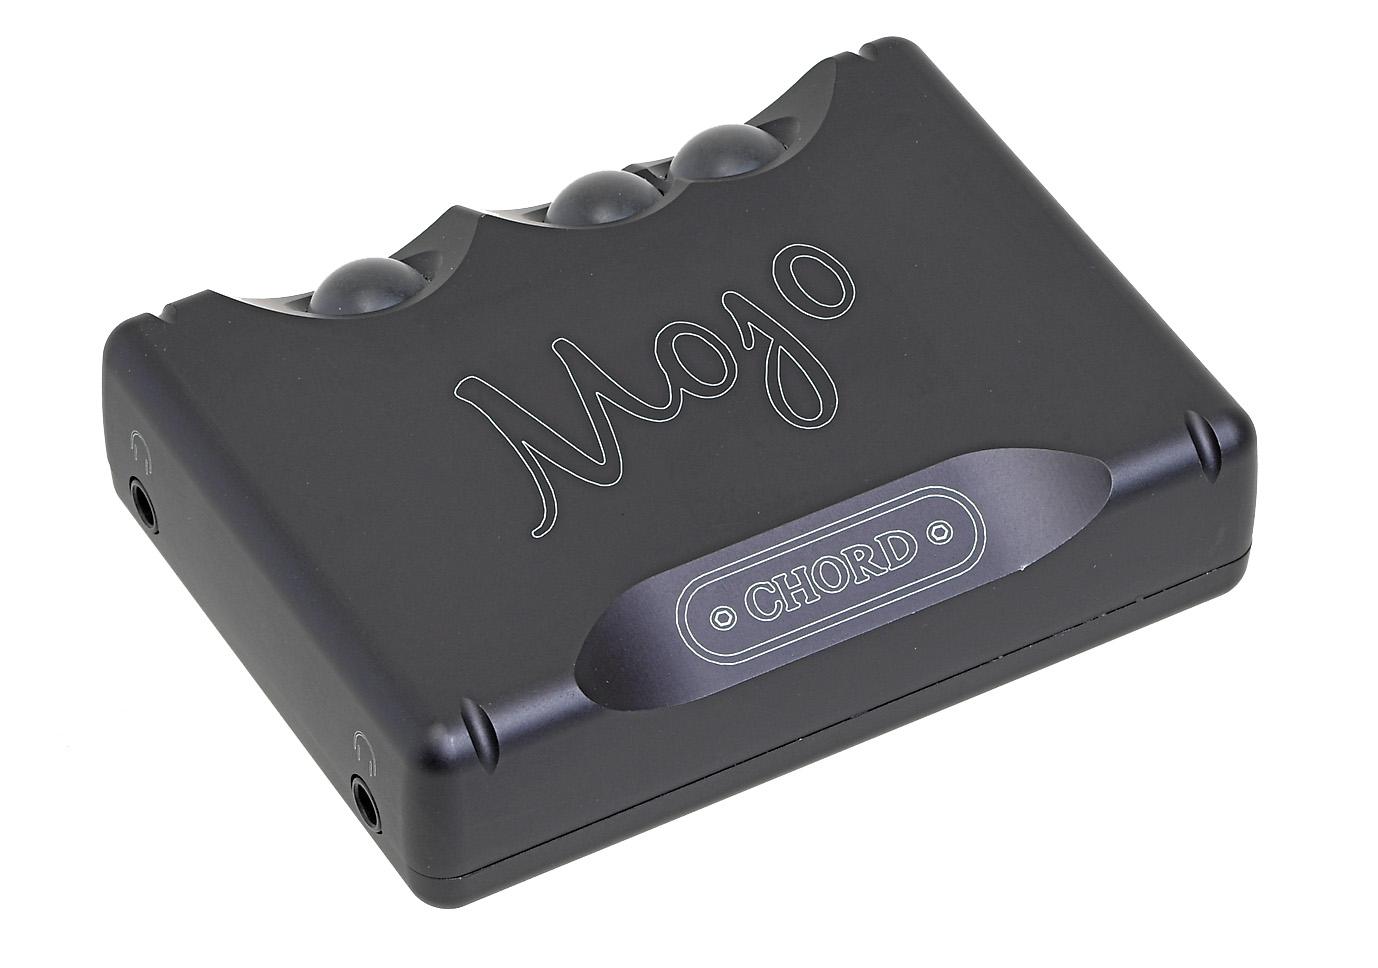 "<a href=""https://chordelectronics.co.uk/product/mojo/"" class=""n"" target=""_blank"">Chord Electronics Mojo</a>"